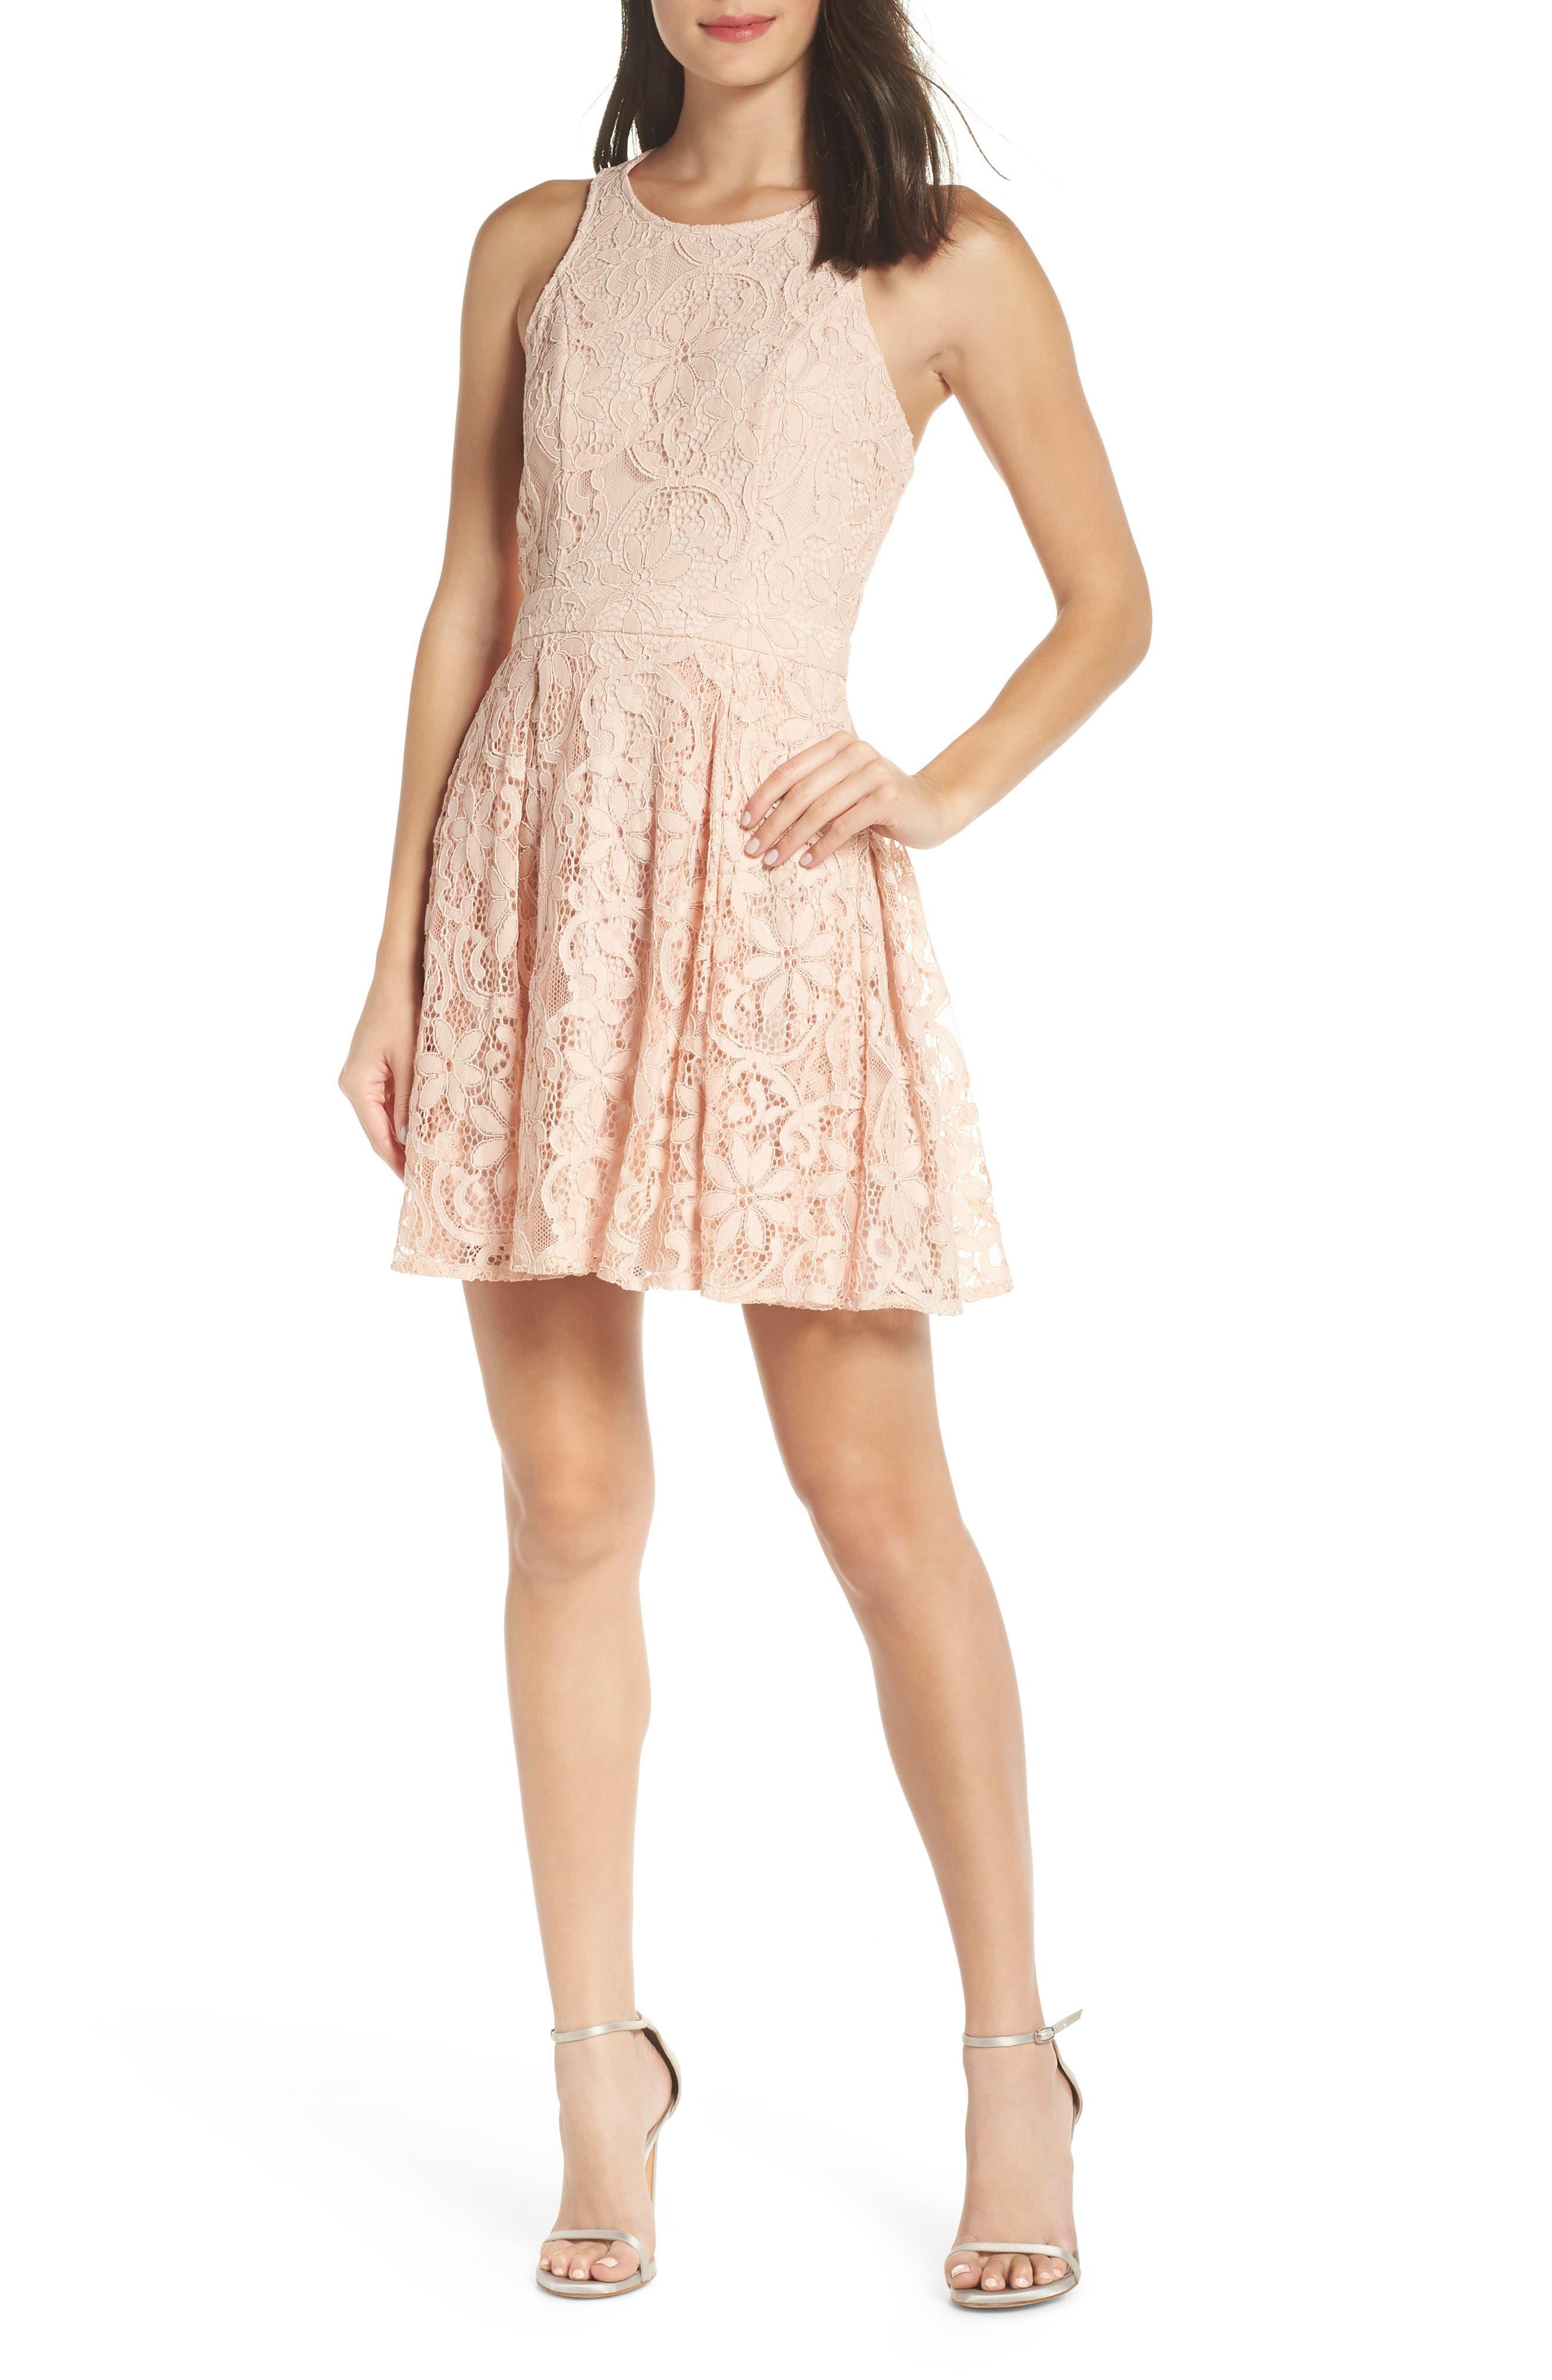 Lulus Racerback Lace Party Dress, Pink